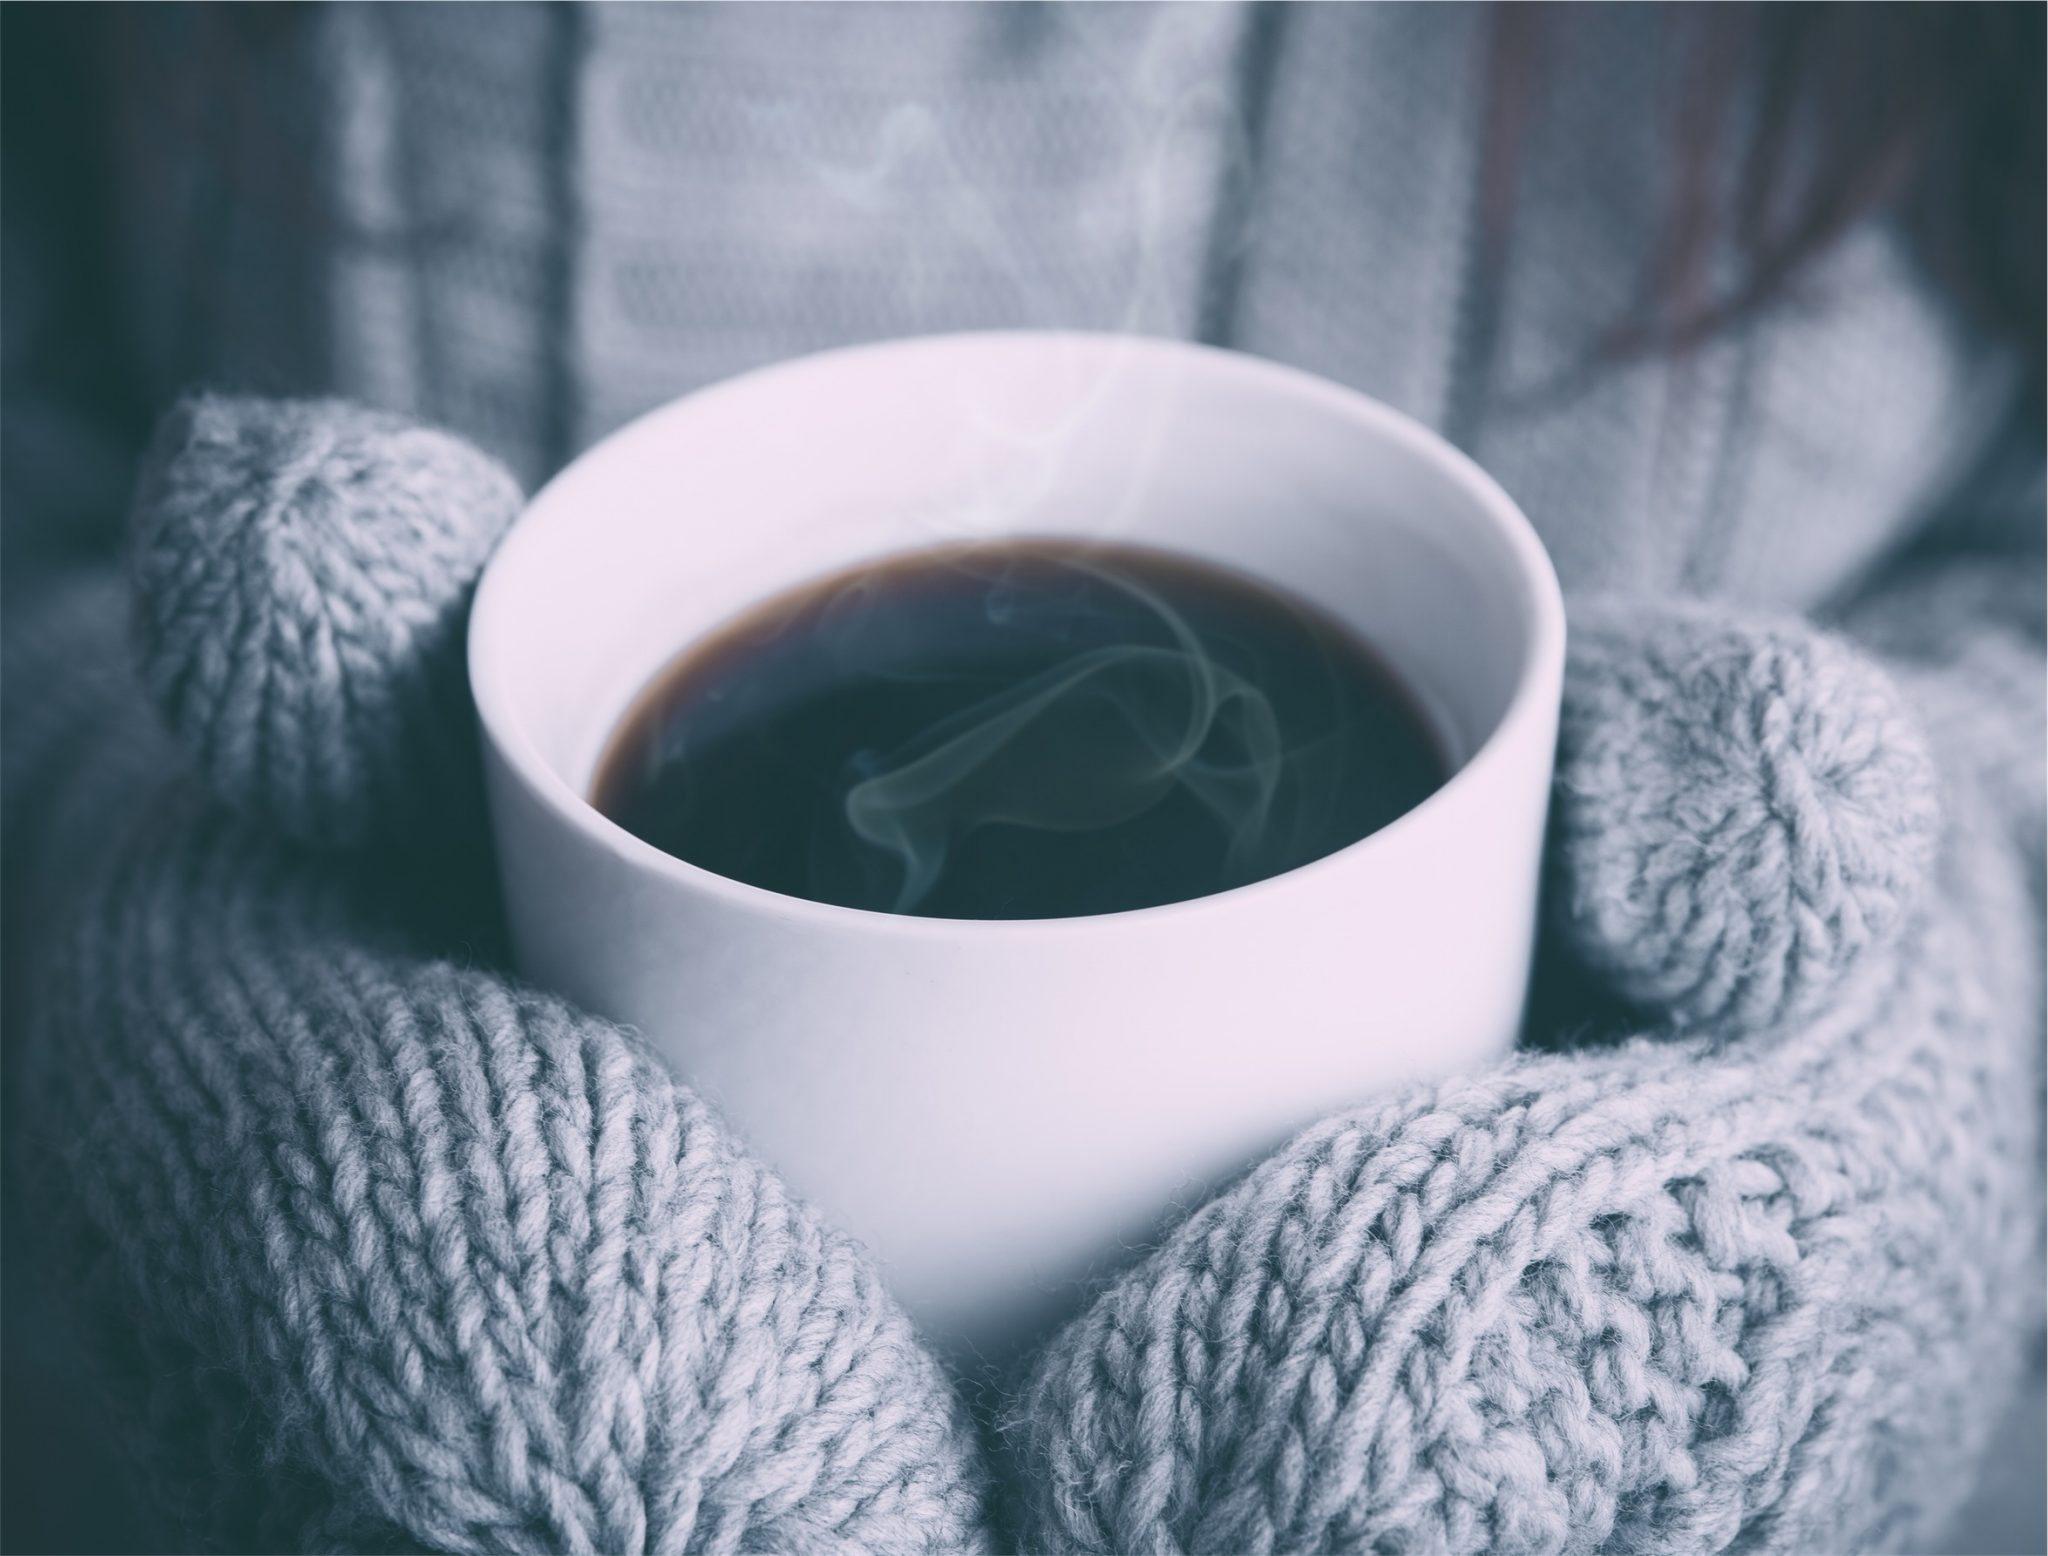 How to Get Term Life Insurance With Sleep Apnea